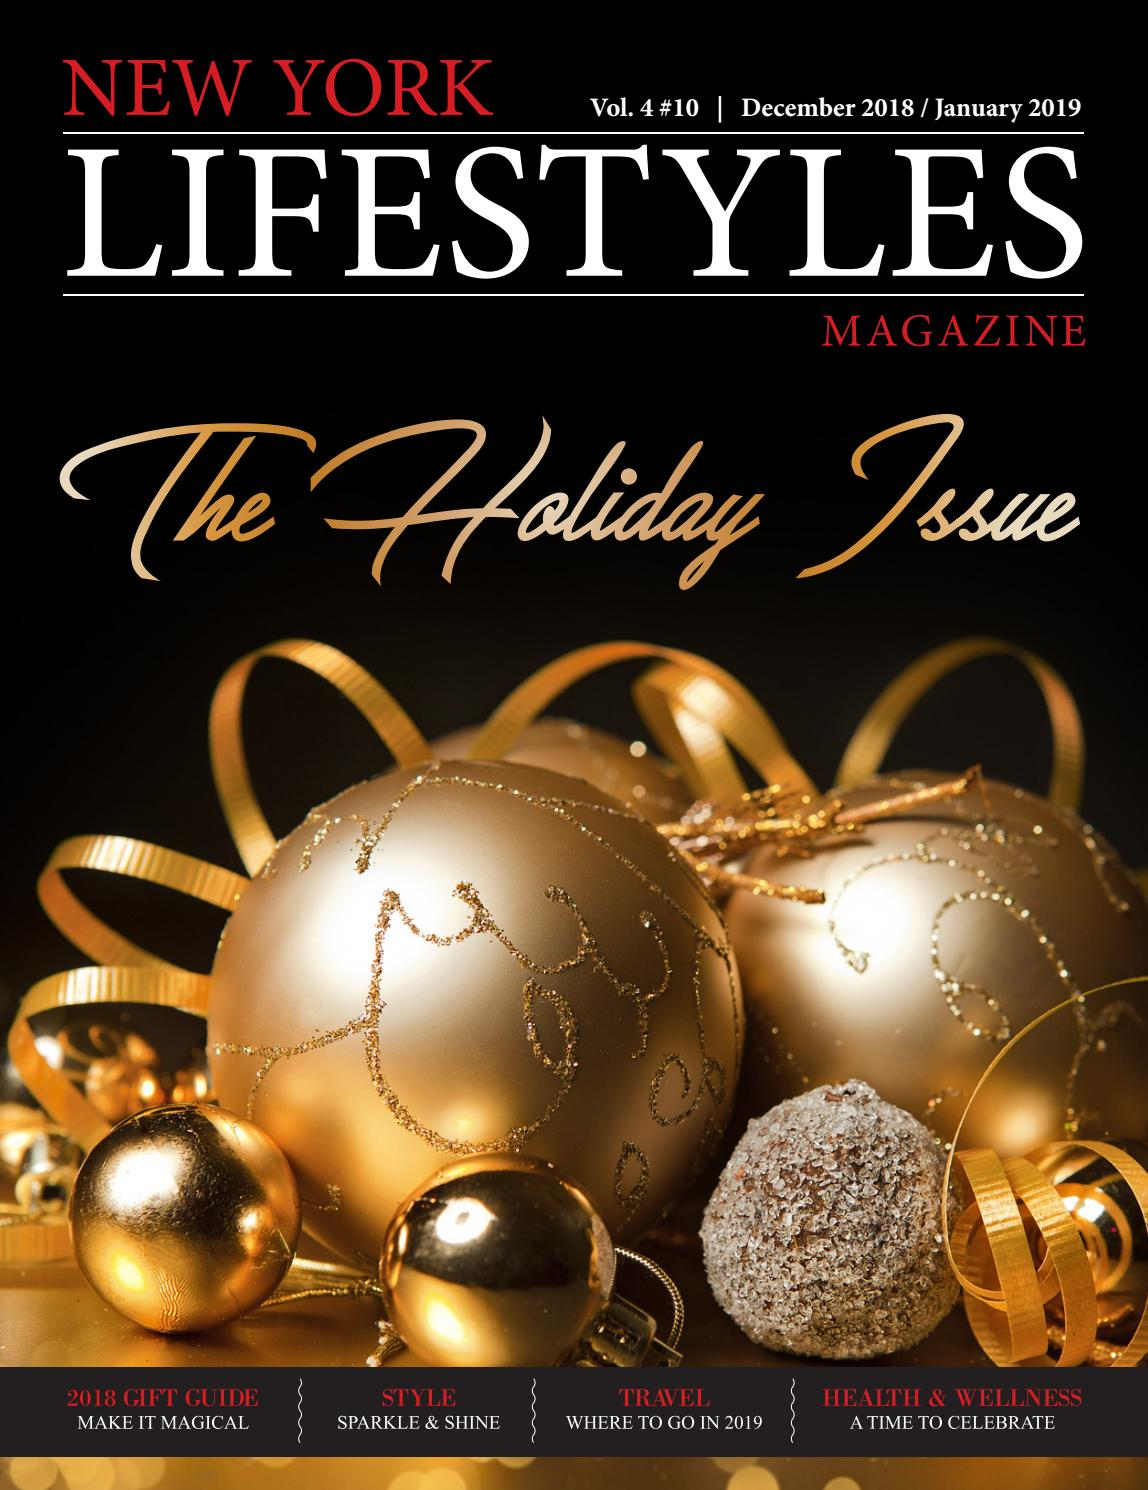 331630ec741f New York Lifestyles Magazine - December 2018   January 2019 by New York  Lifestyles Magazine - issuu